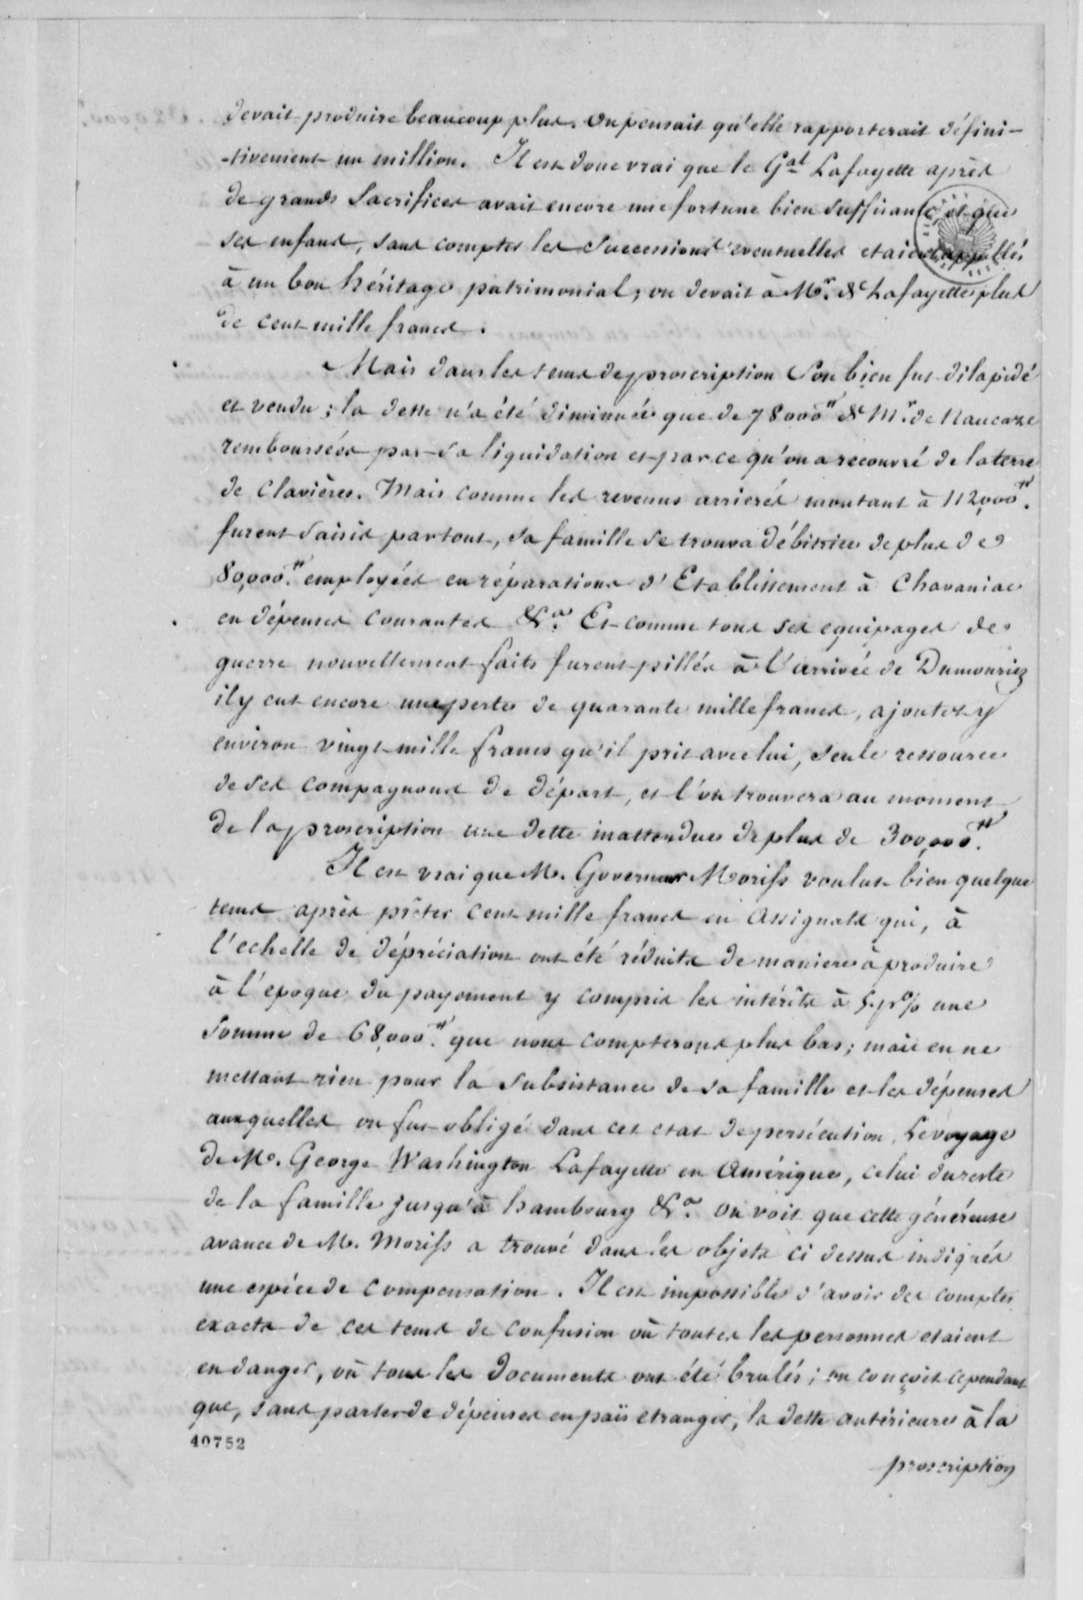 Marie Joseph Paul Yves Roch Gilbert du Motier, Marquis de Lafayette, no date, Statement of Affairs in French